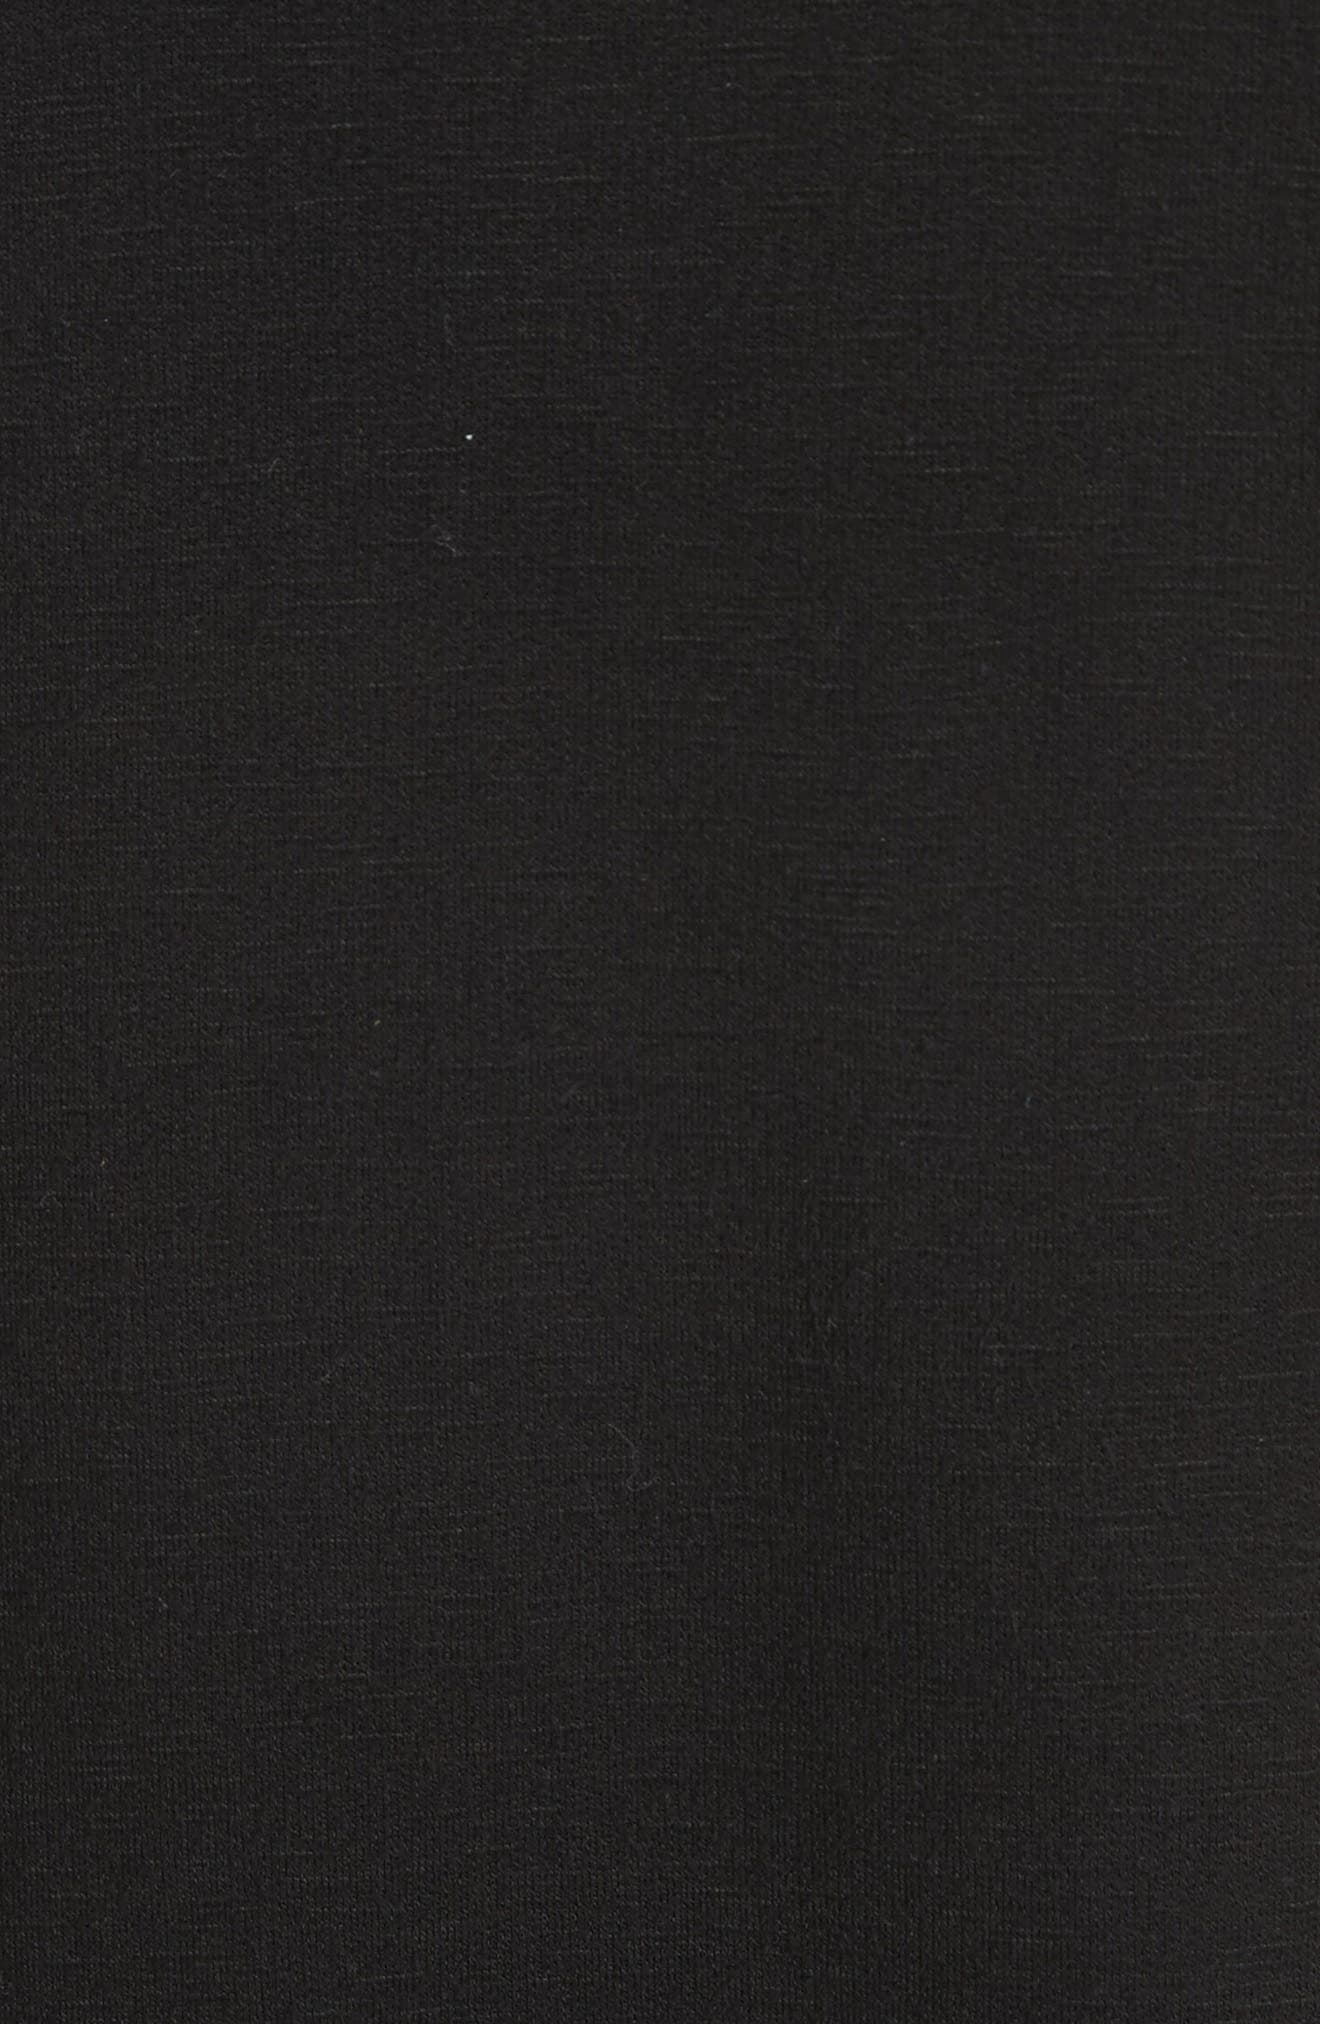 Bow Sleeve Midi Dress,                             Alternate thumbnail 5, color,                             Black